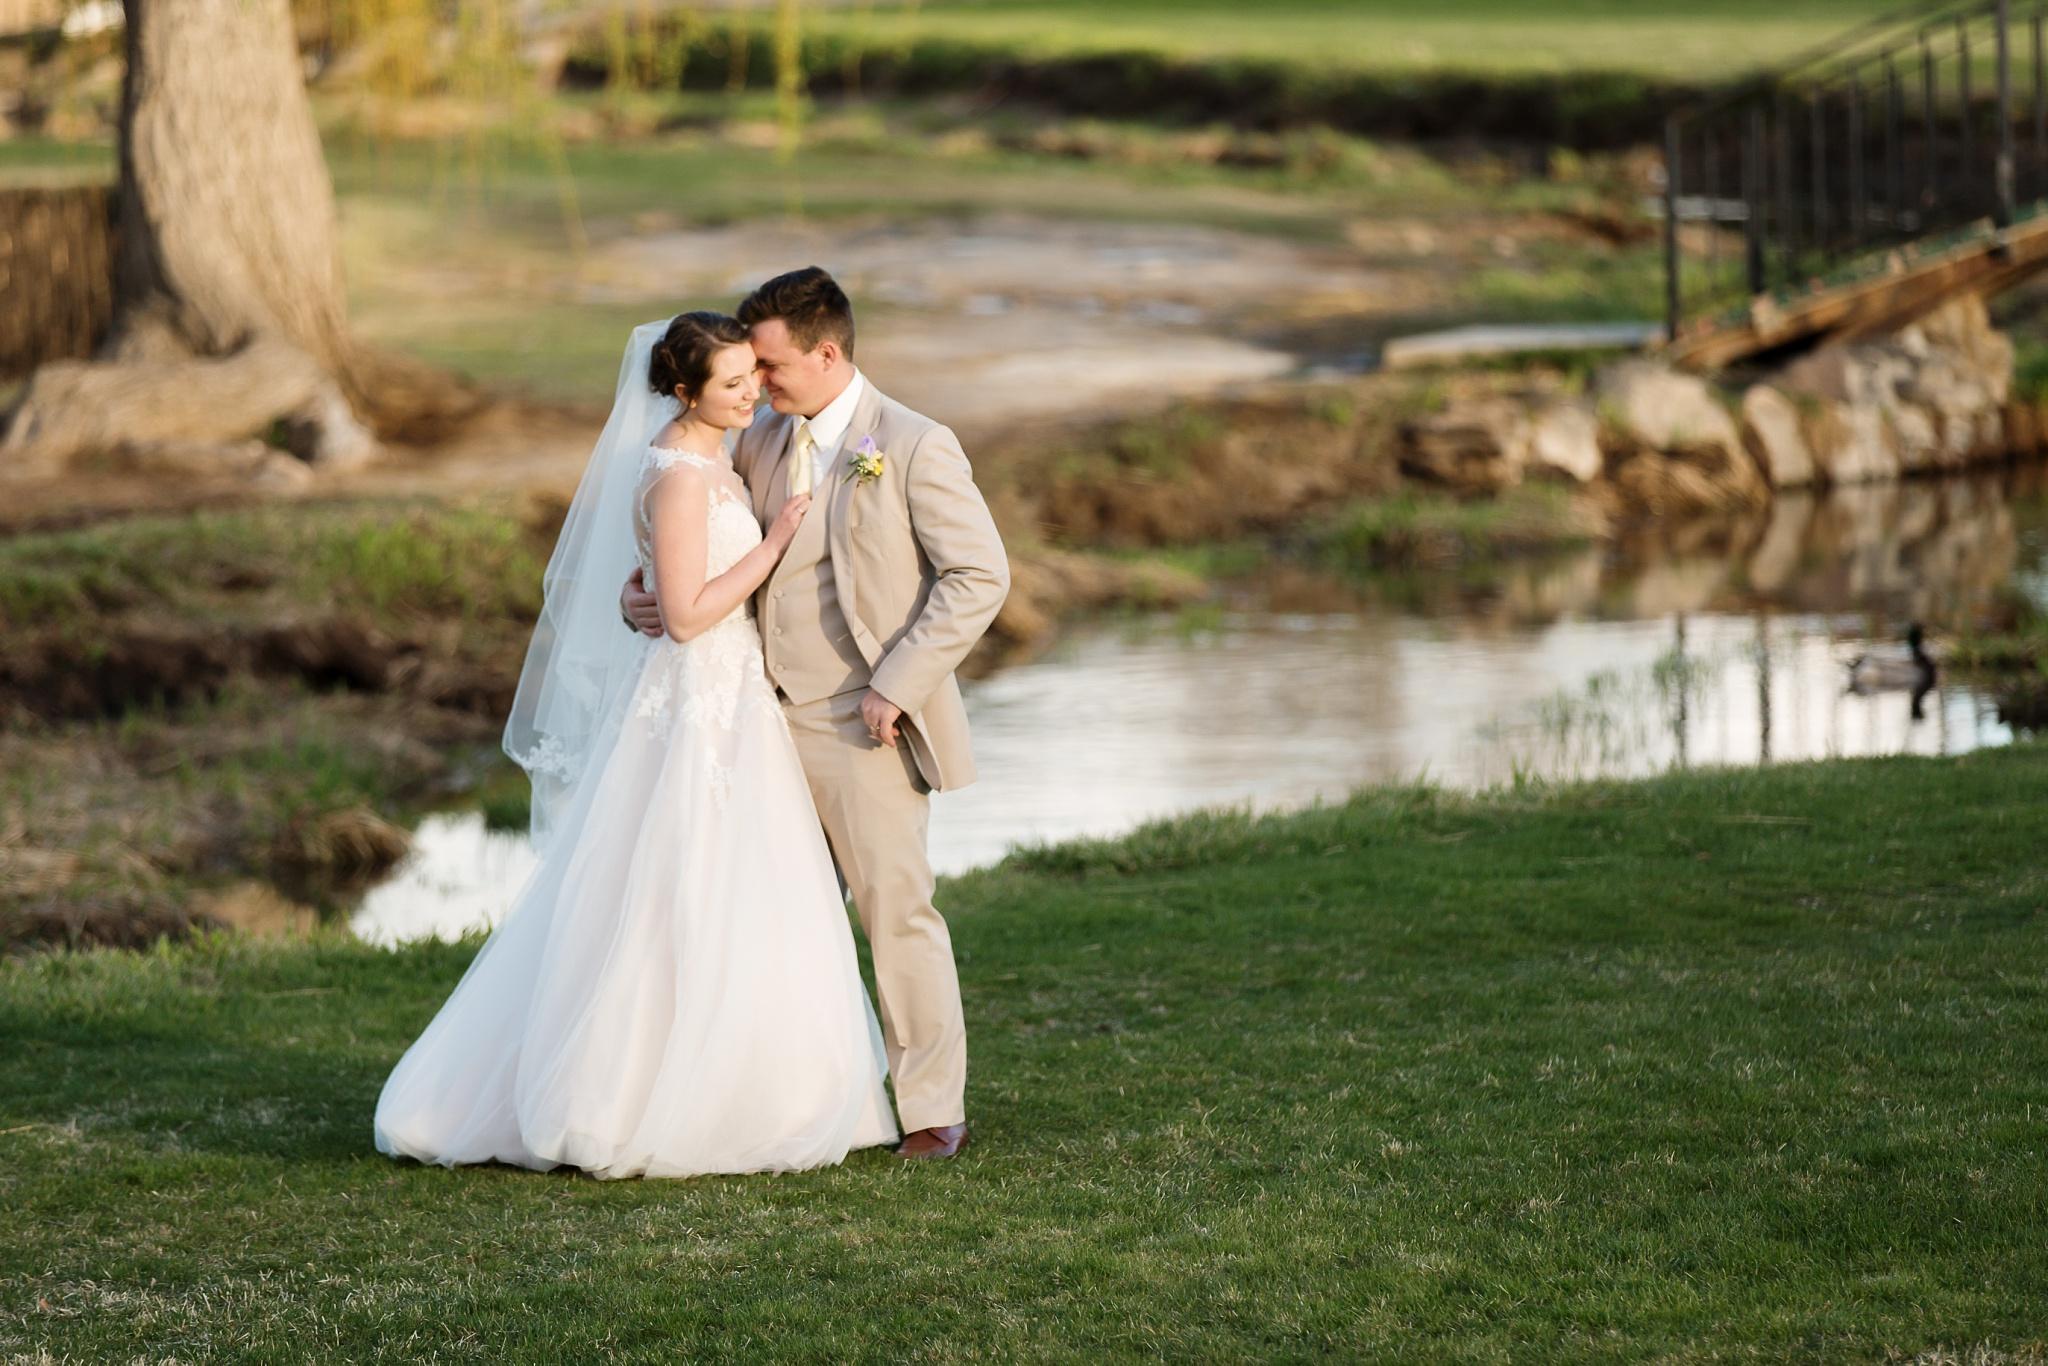 Wedding Photography_Meridian Idaho_Nampa Idaho_Leah Southwick Photography_0080.jpg